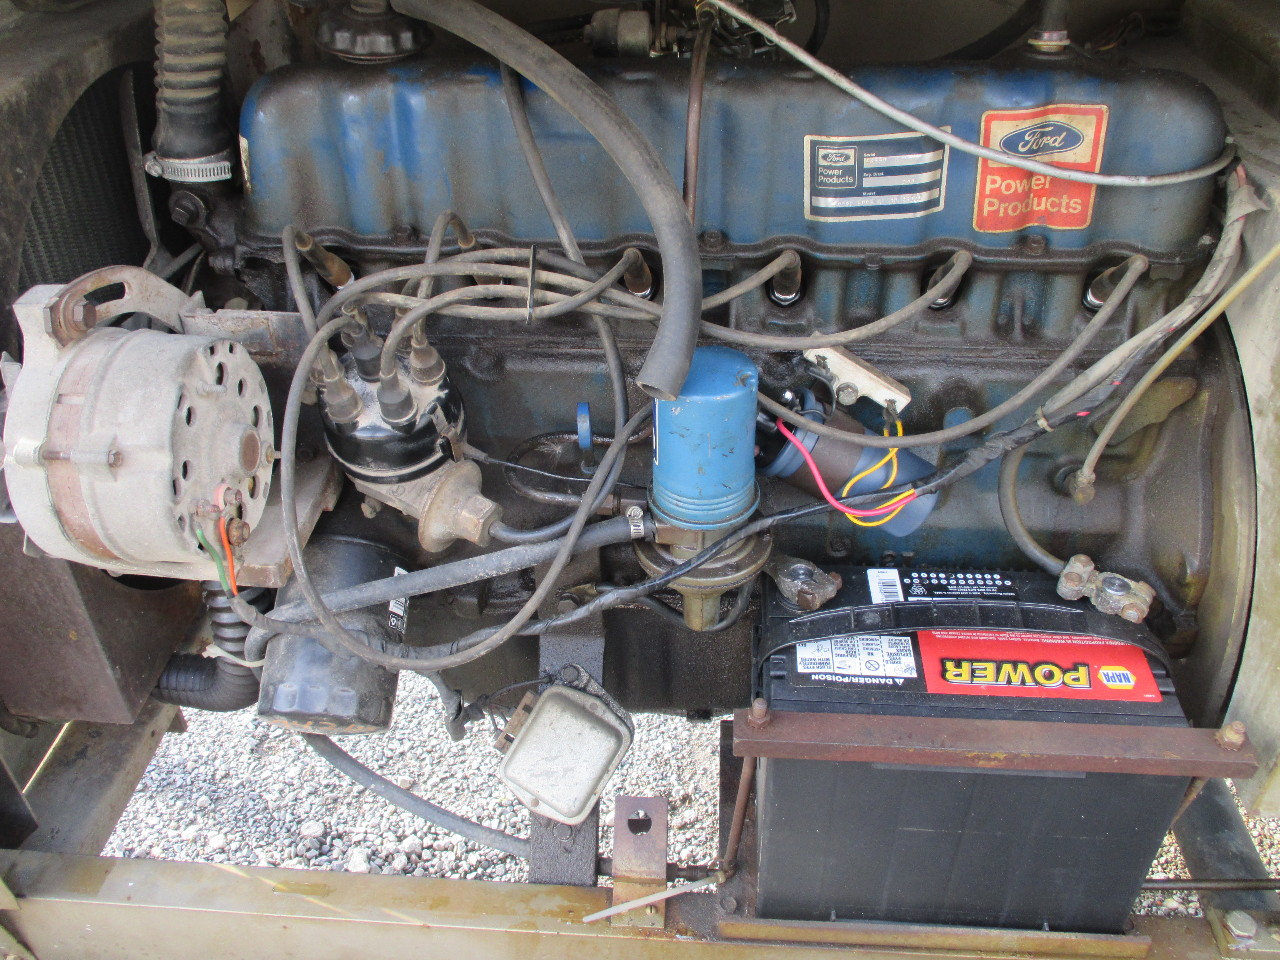 Dis Hobart Welder Gr Trailer Mounted W Ford Cyl Engine